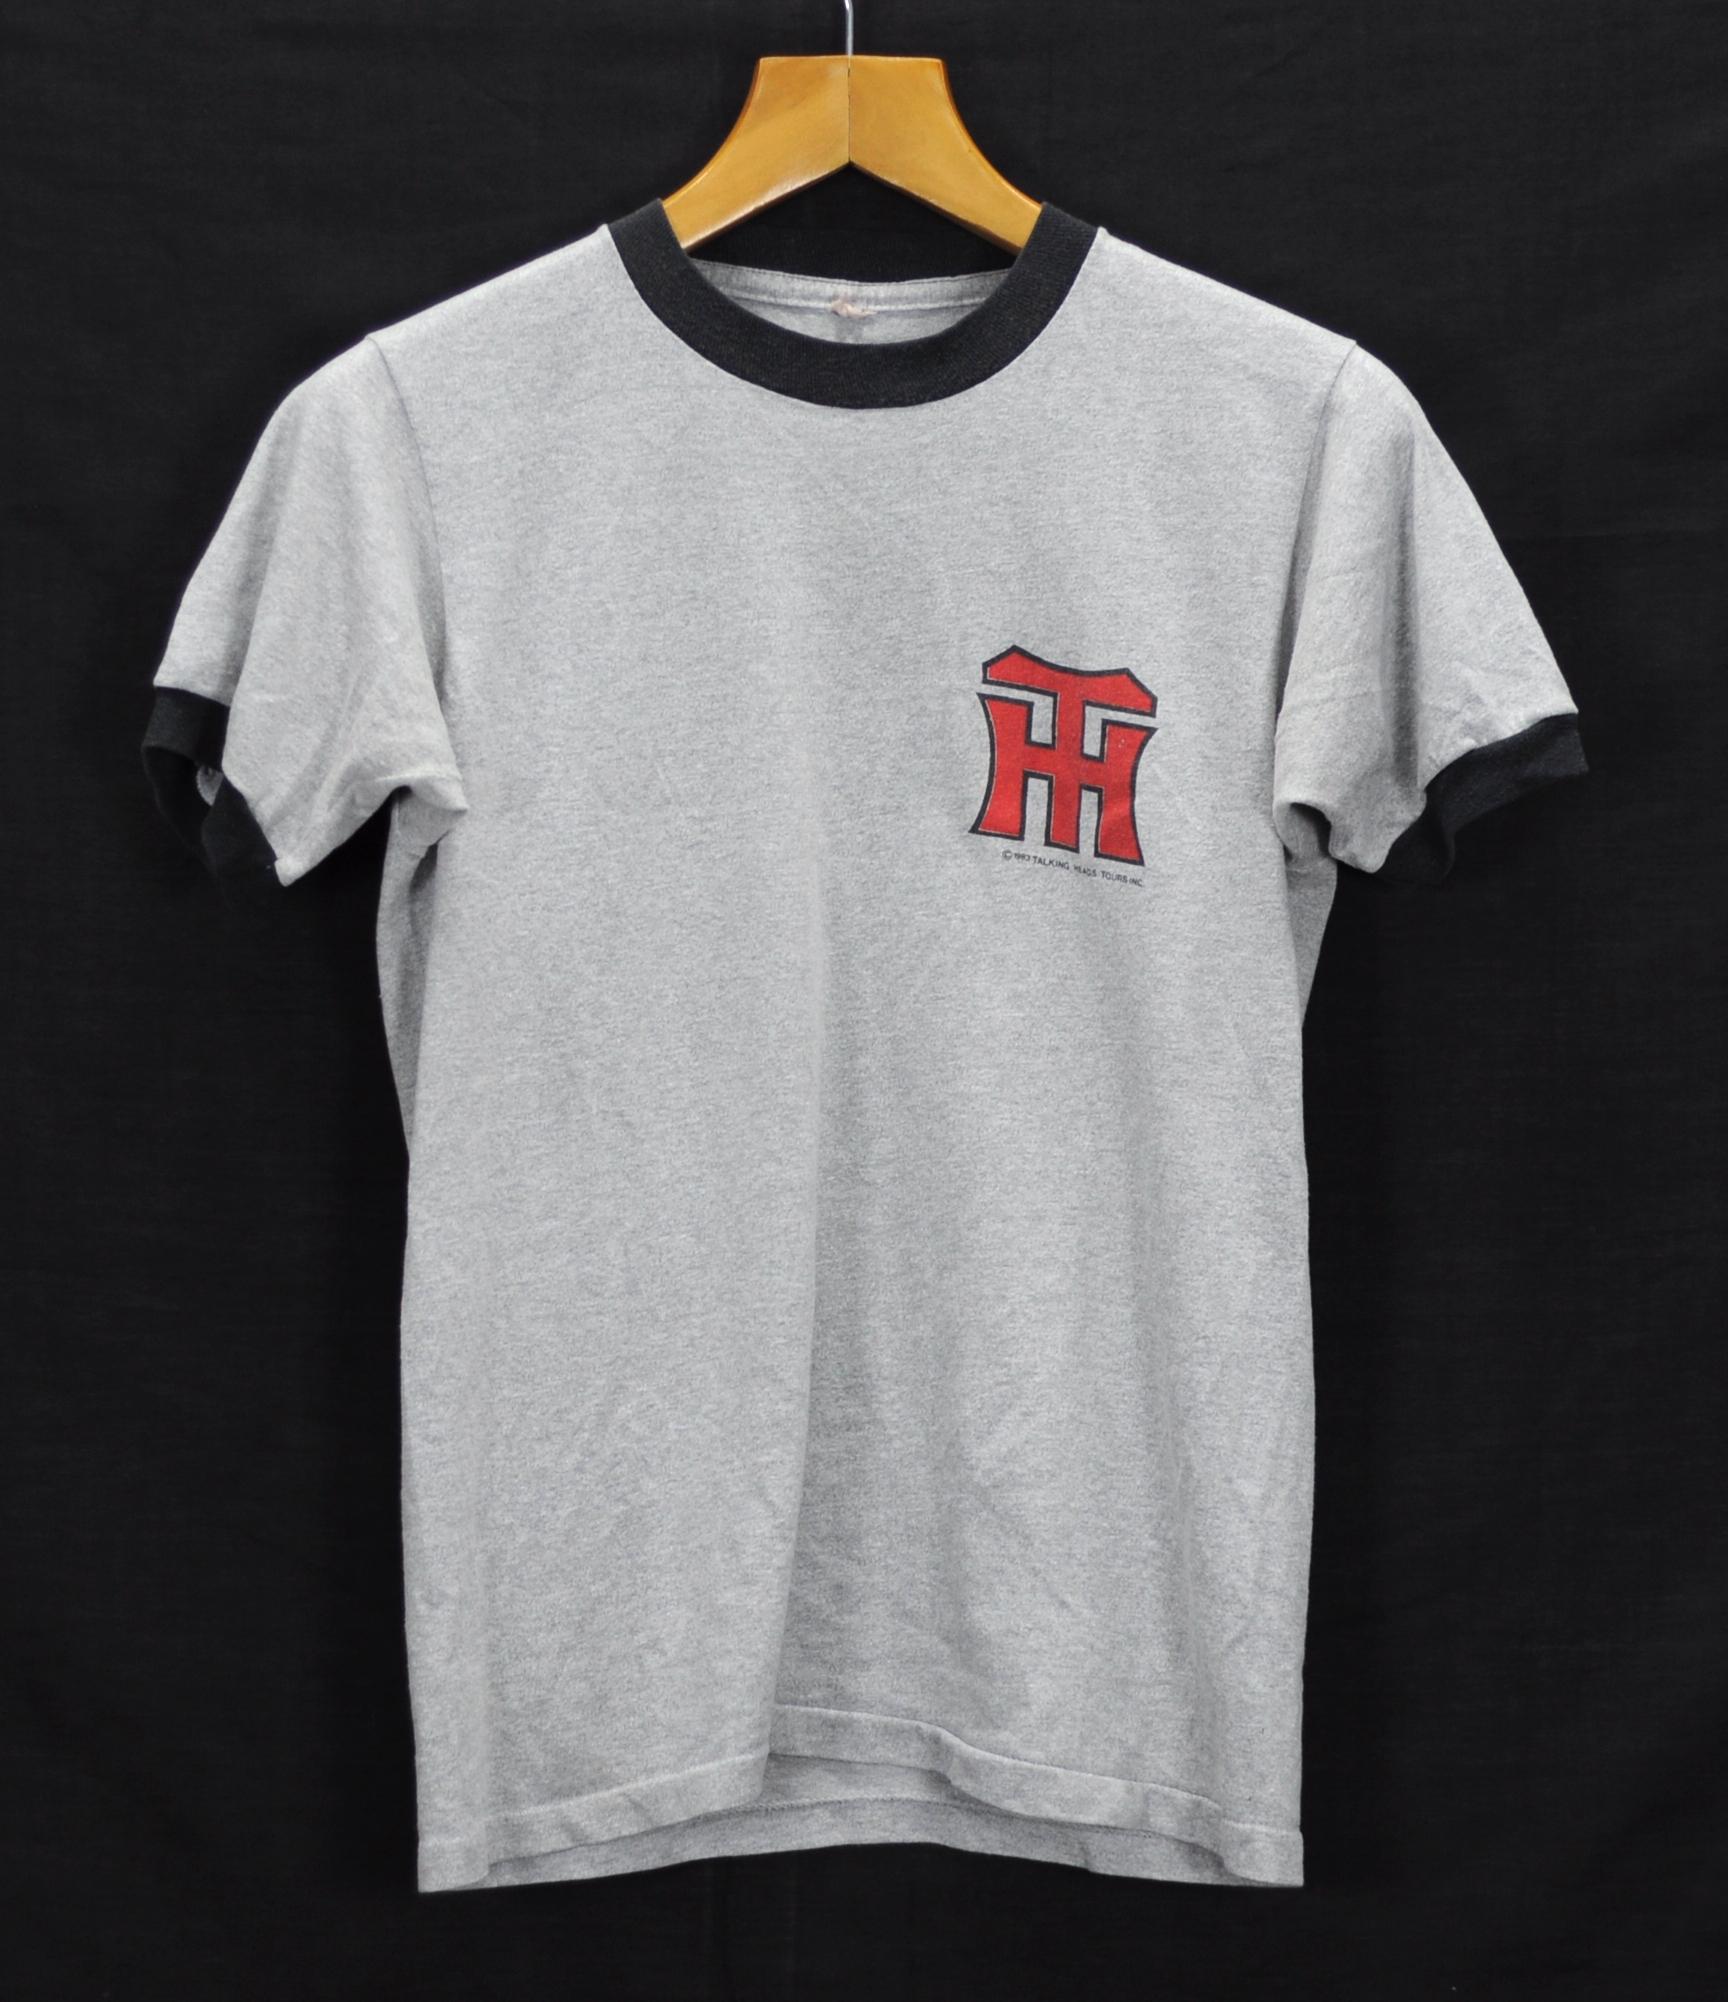 Talking Heads Punk Rock Cool Rétro Hommes Femmes Débardeur Tank Top Unisexe T Shirt 2210